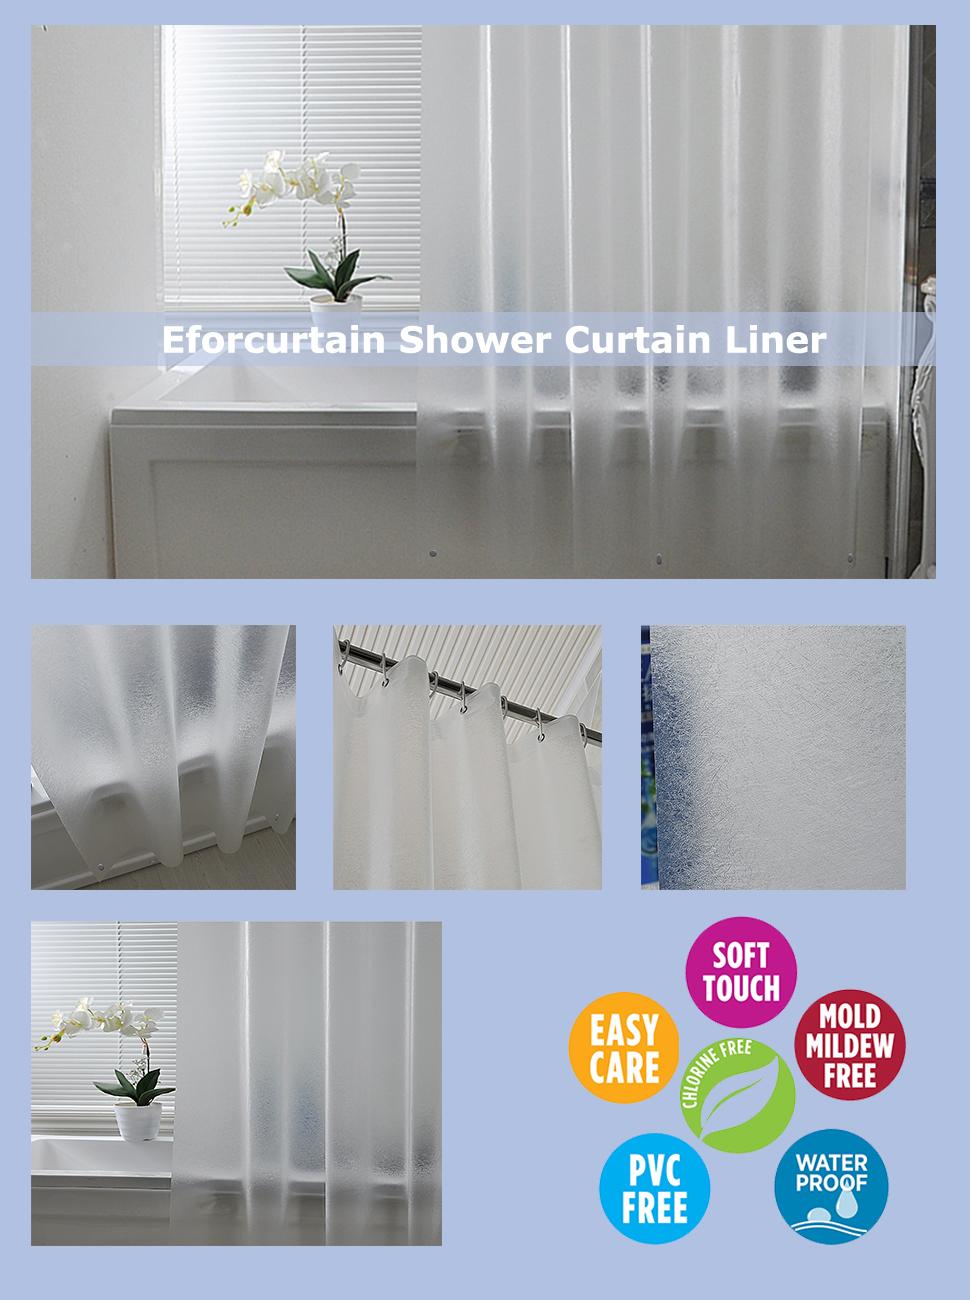 Amazon.com: Eforcurtain Subtle Semi-transparent Shower Curtain 18 ...